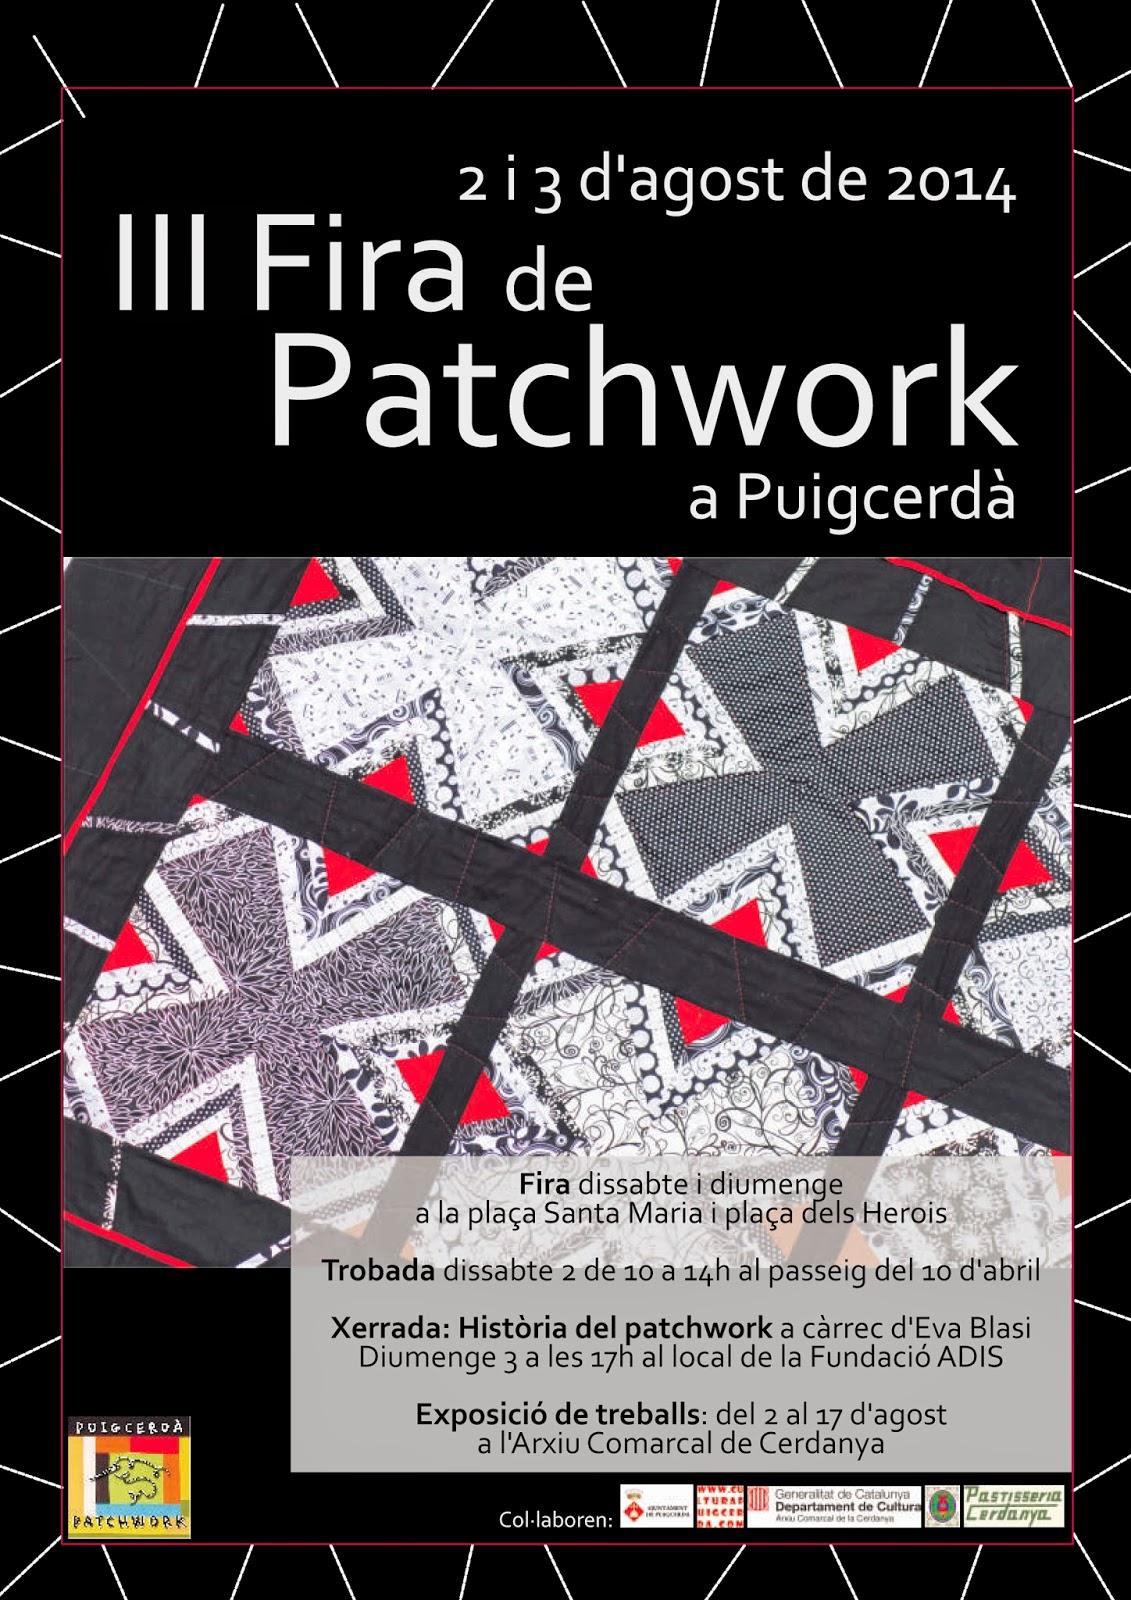 http://associaciopuigcerdapatchwork.blogspot.com.es/